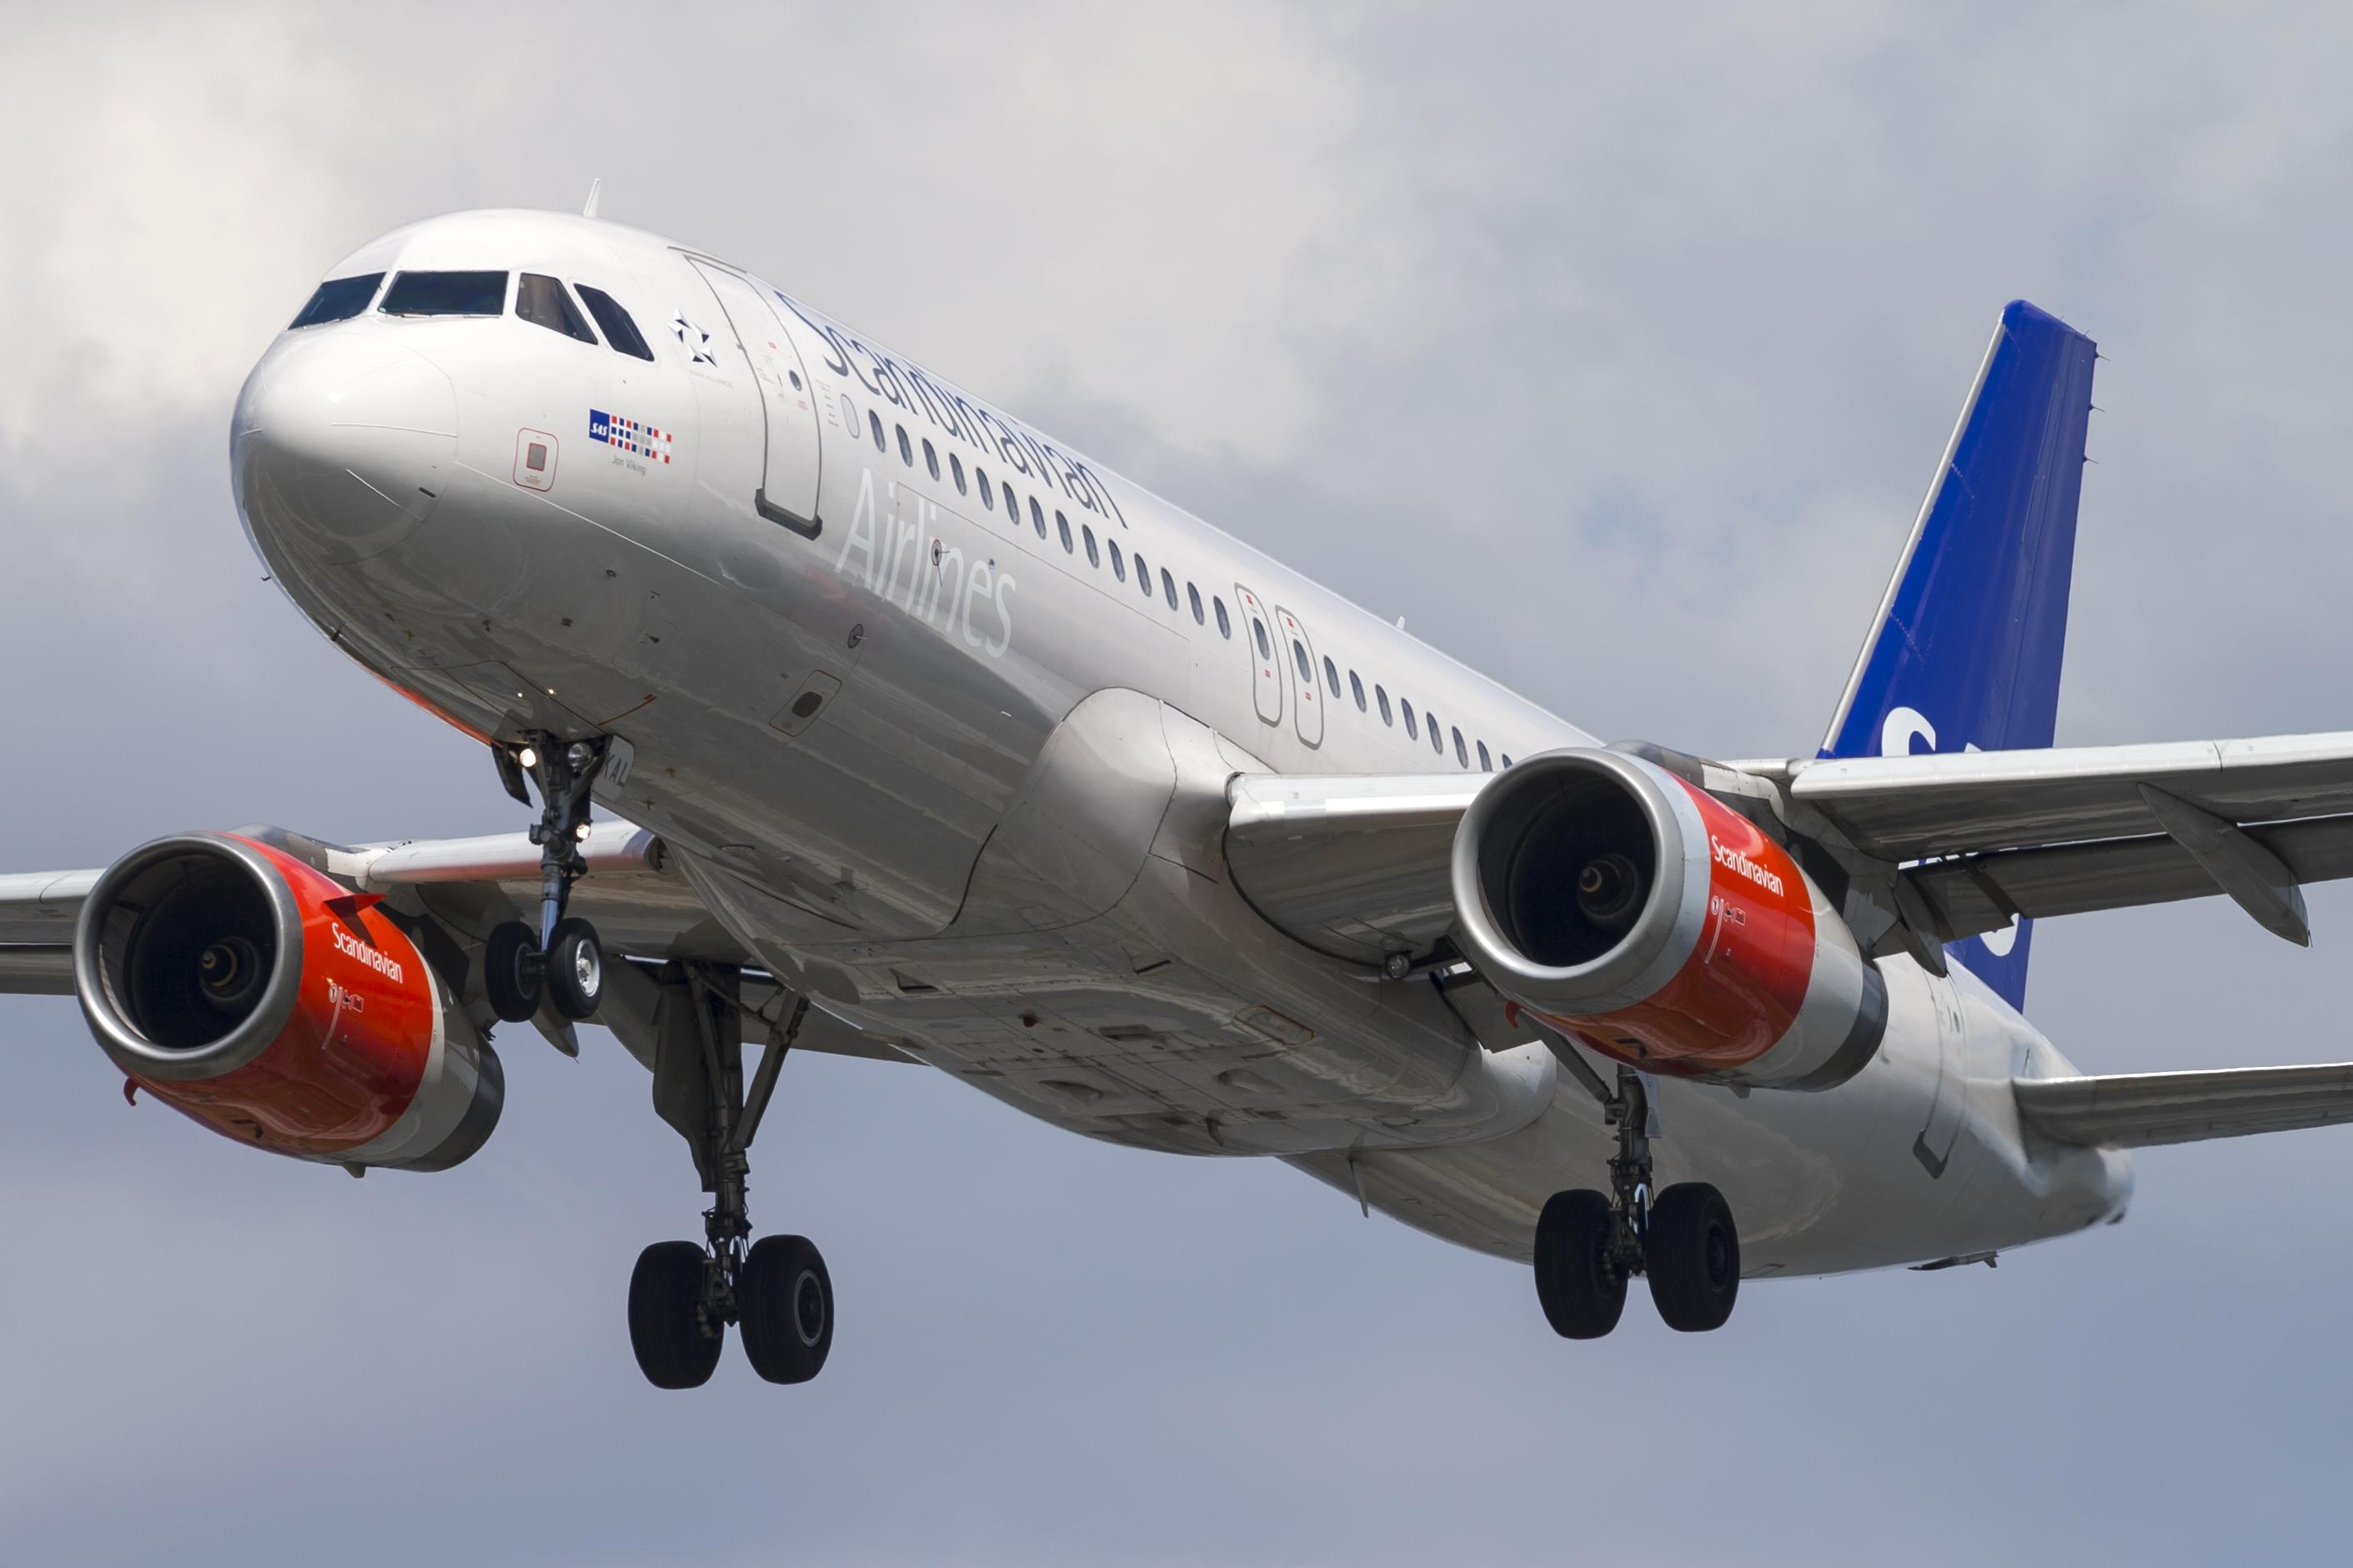 Airbus A320-200 fra SAS. (Foto: © Thorbjørn Brunander Sund, Danish Aviation Photo)